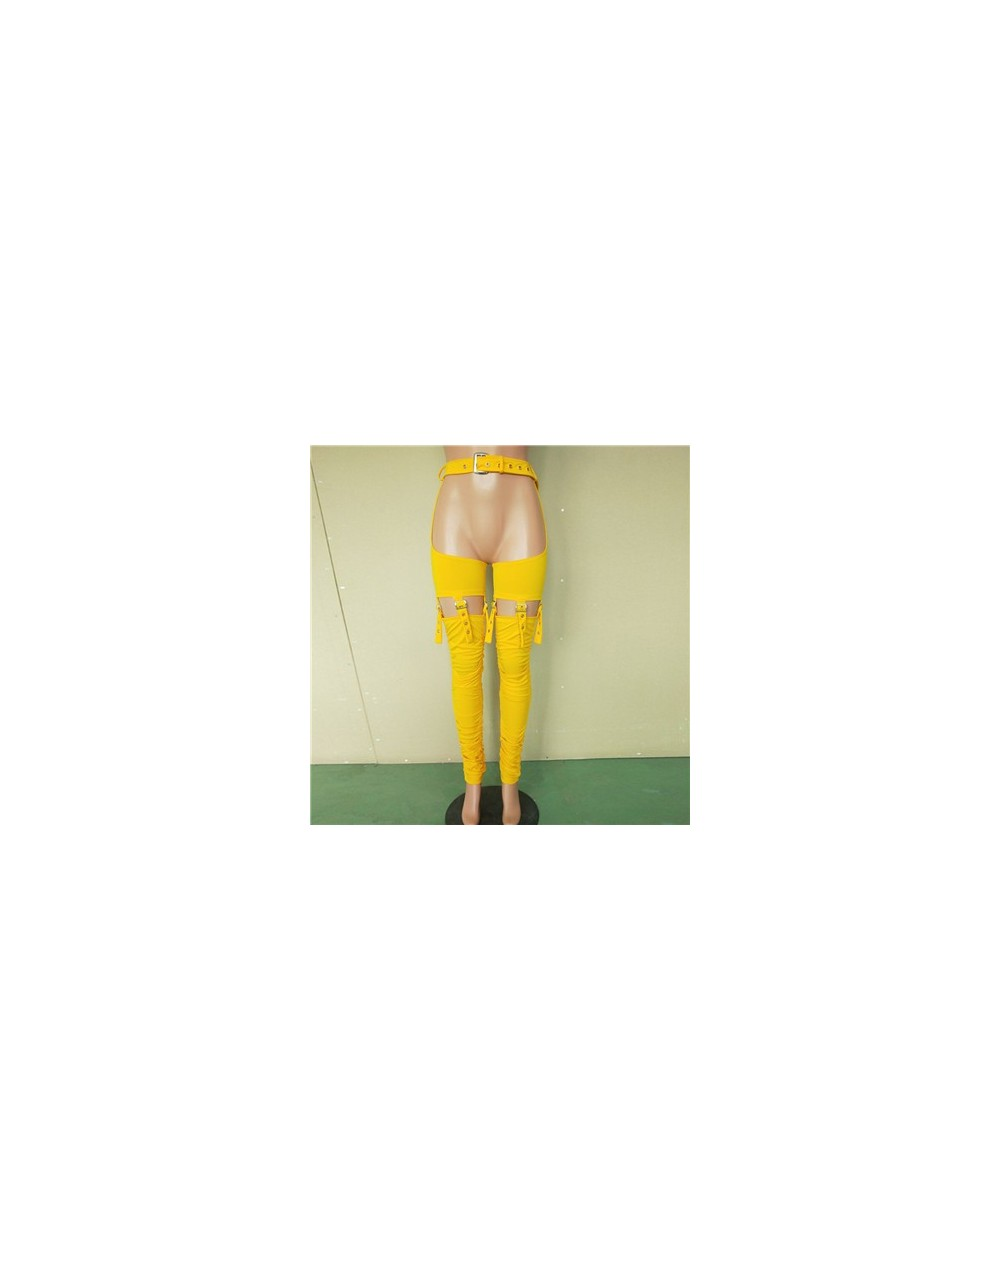 PU Leather Nightclub Pencil Pants Women's Hollow Out Party Bottom High Waist Patchwork Sexy Trousers 2019 Summer Pantalon Mu...